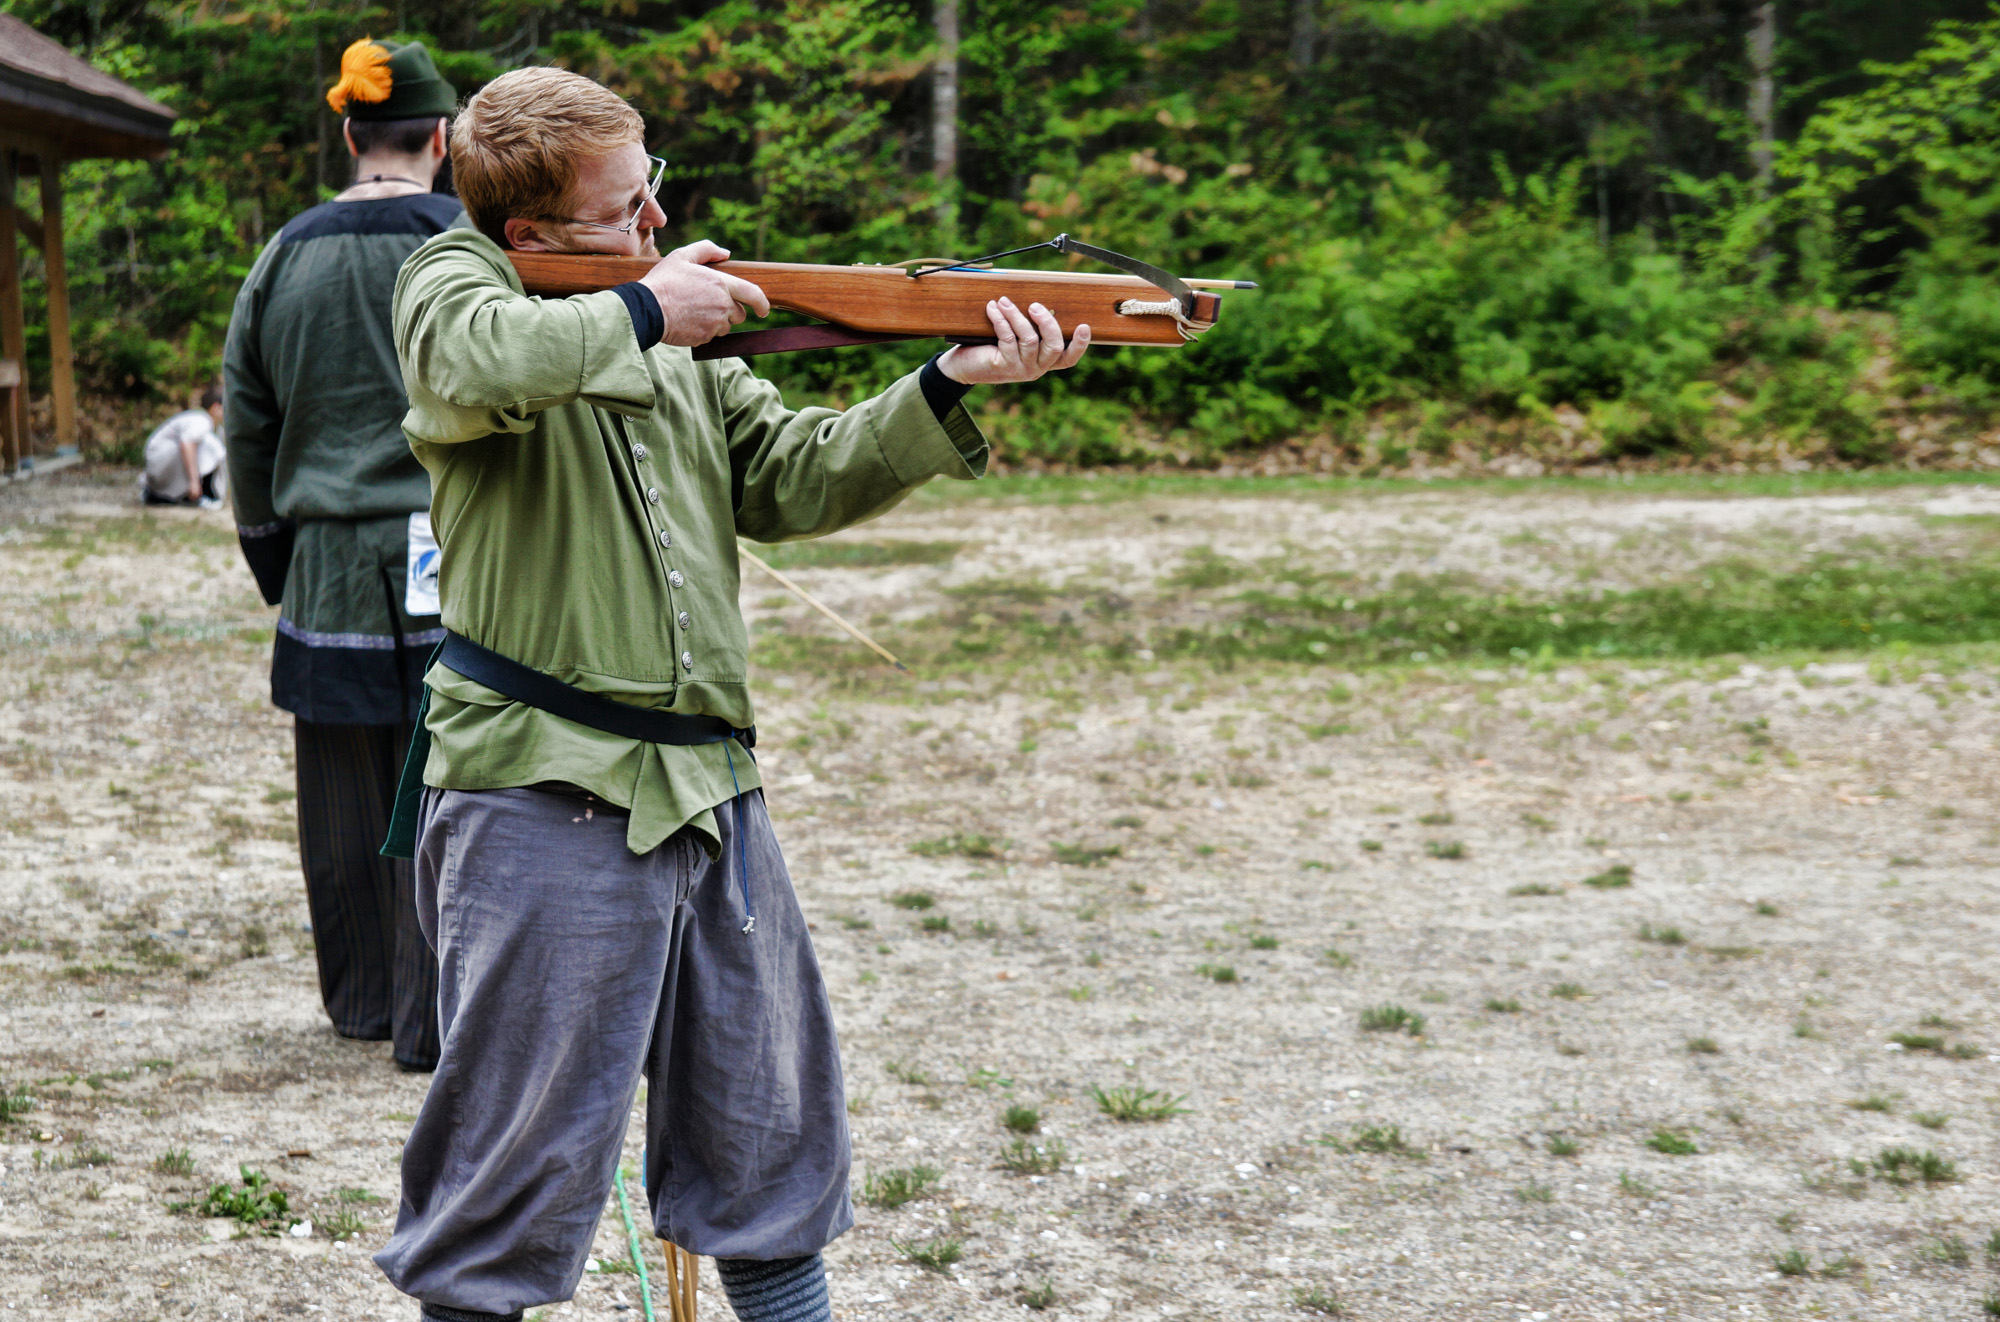 Archery, crossbow shooting